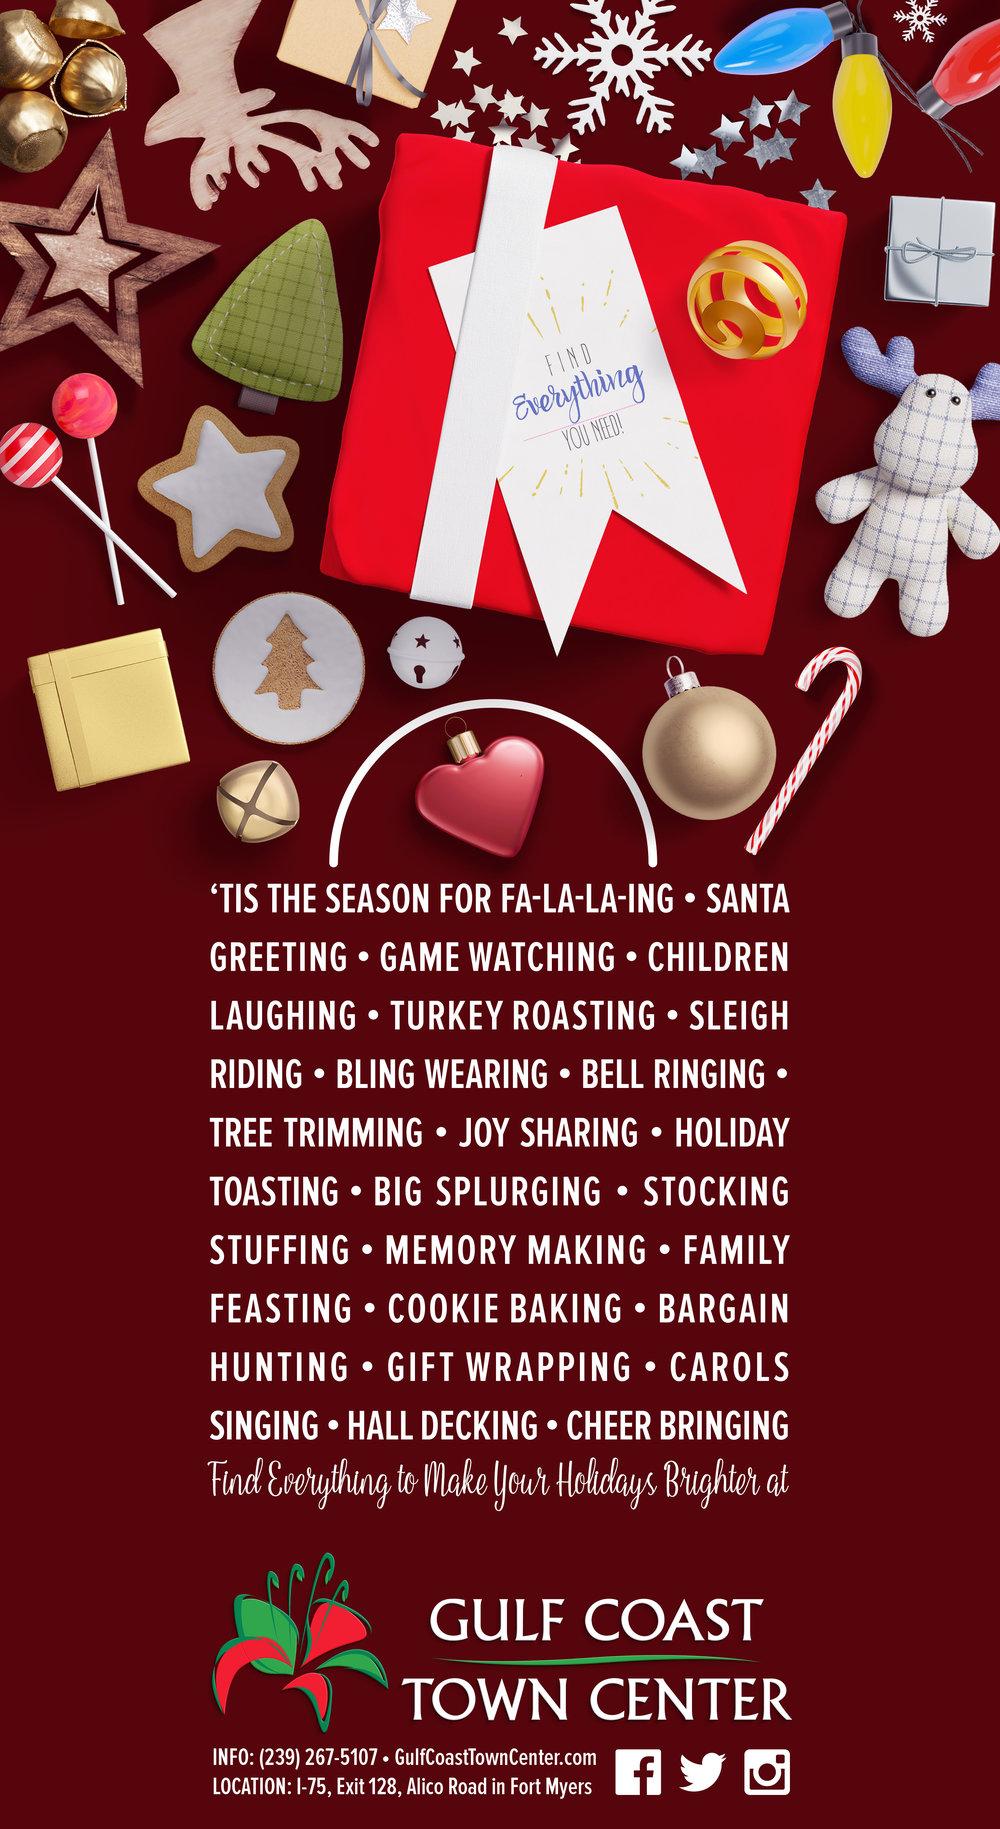 GCTC-Christmas-AD-Banner-LG.jpg